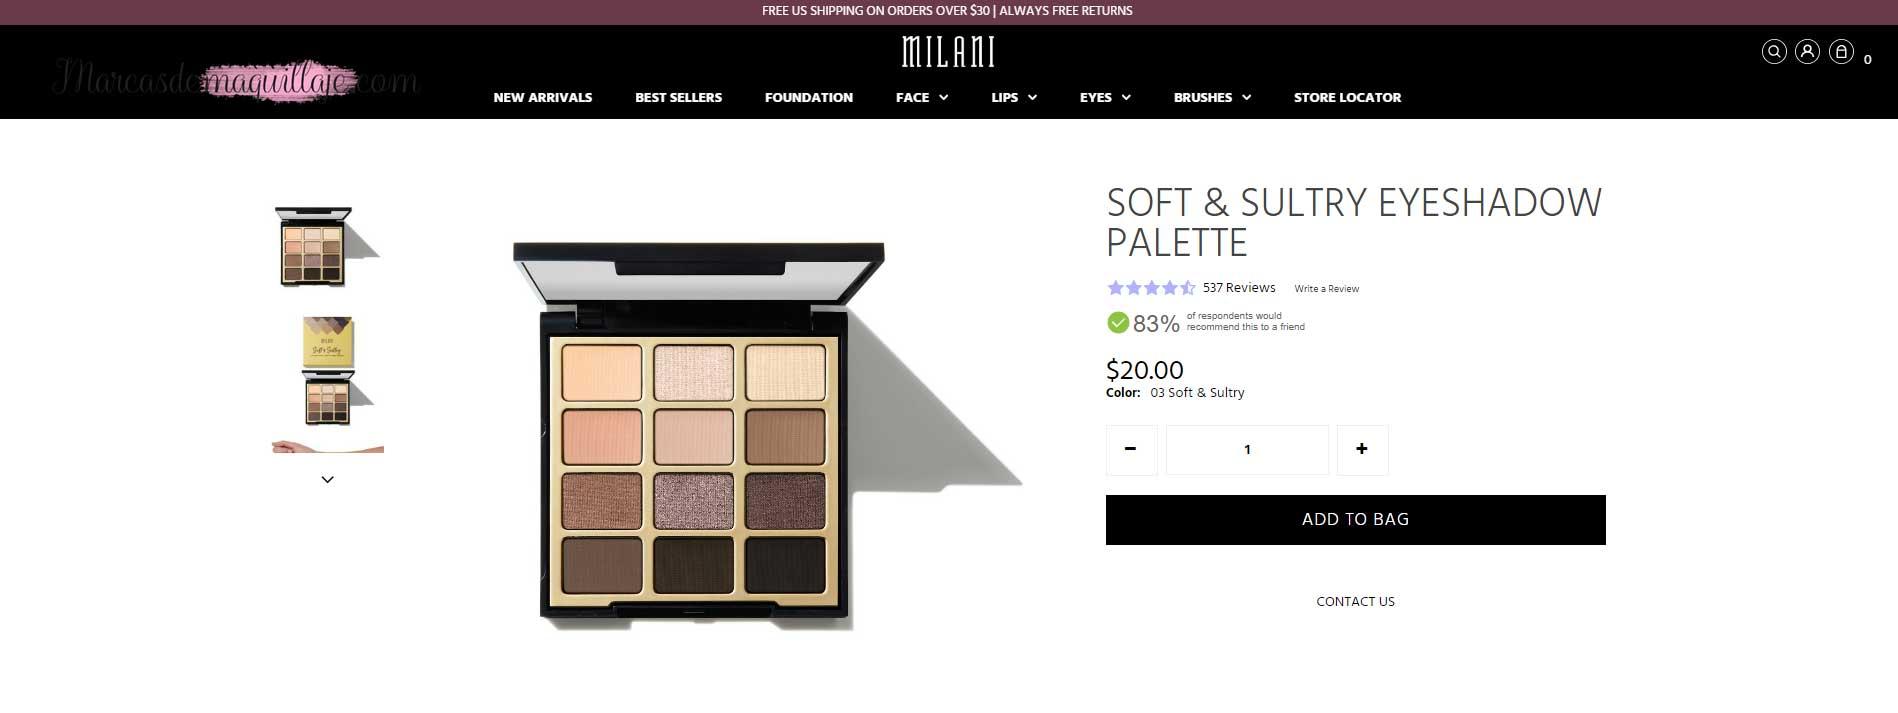 tienda-milani-cosmetics